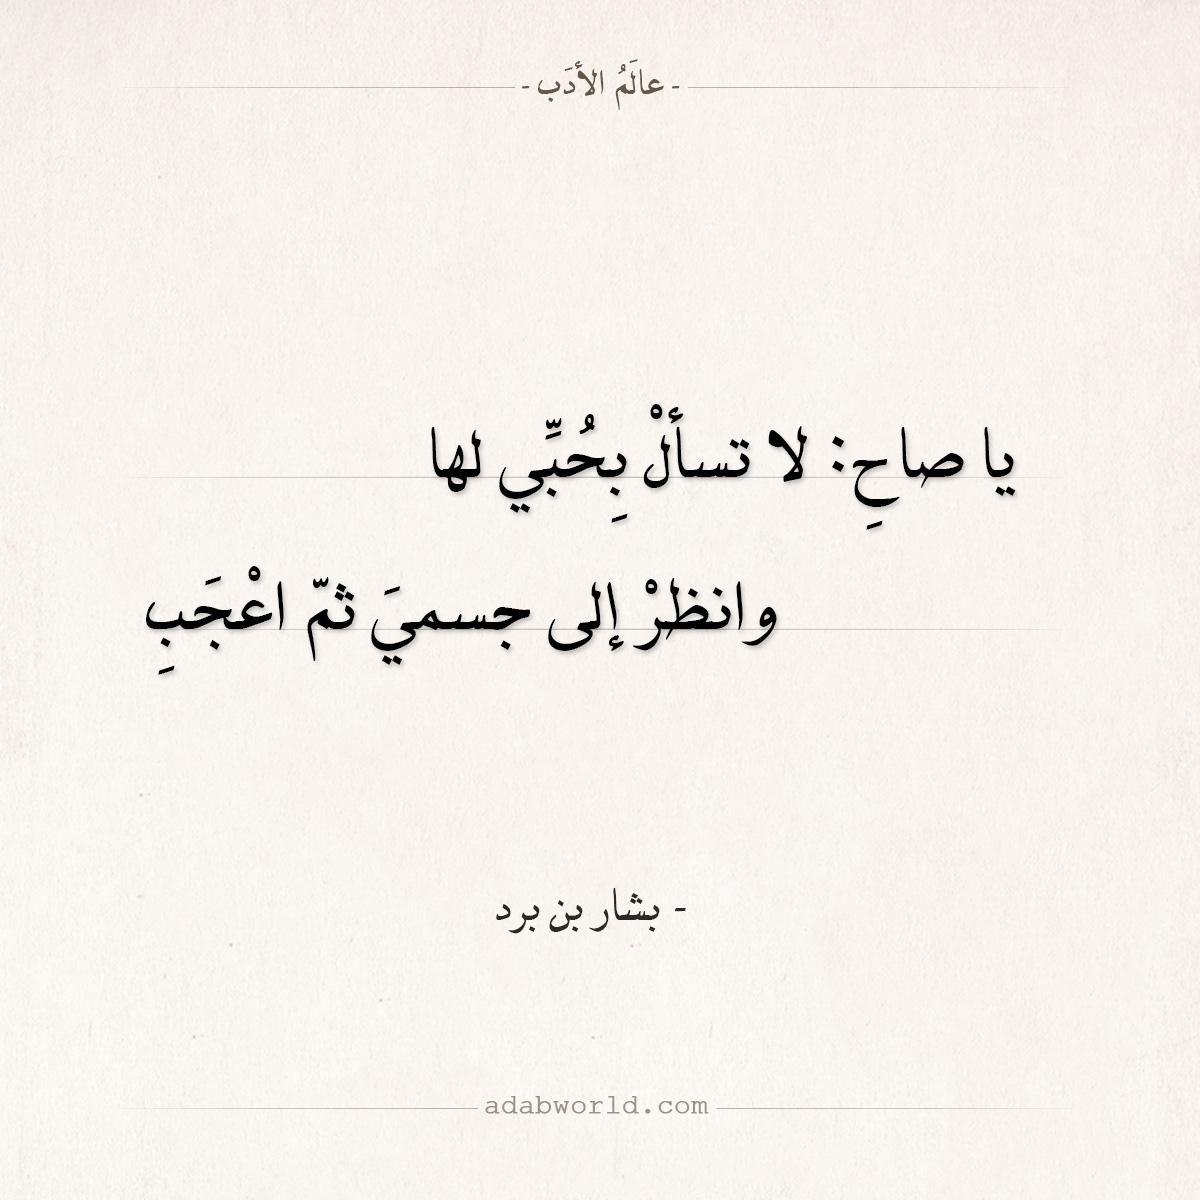 شعر بشار بن برد - يا صاح لا تسأل بحبي لها